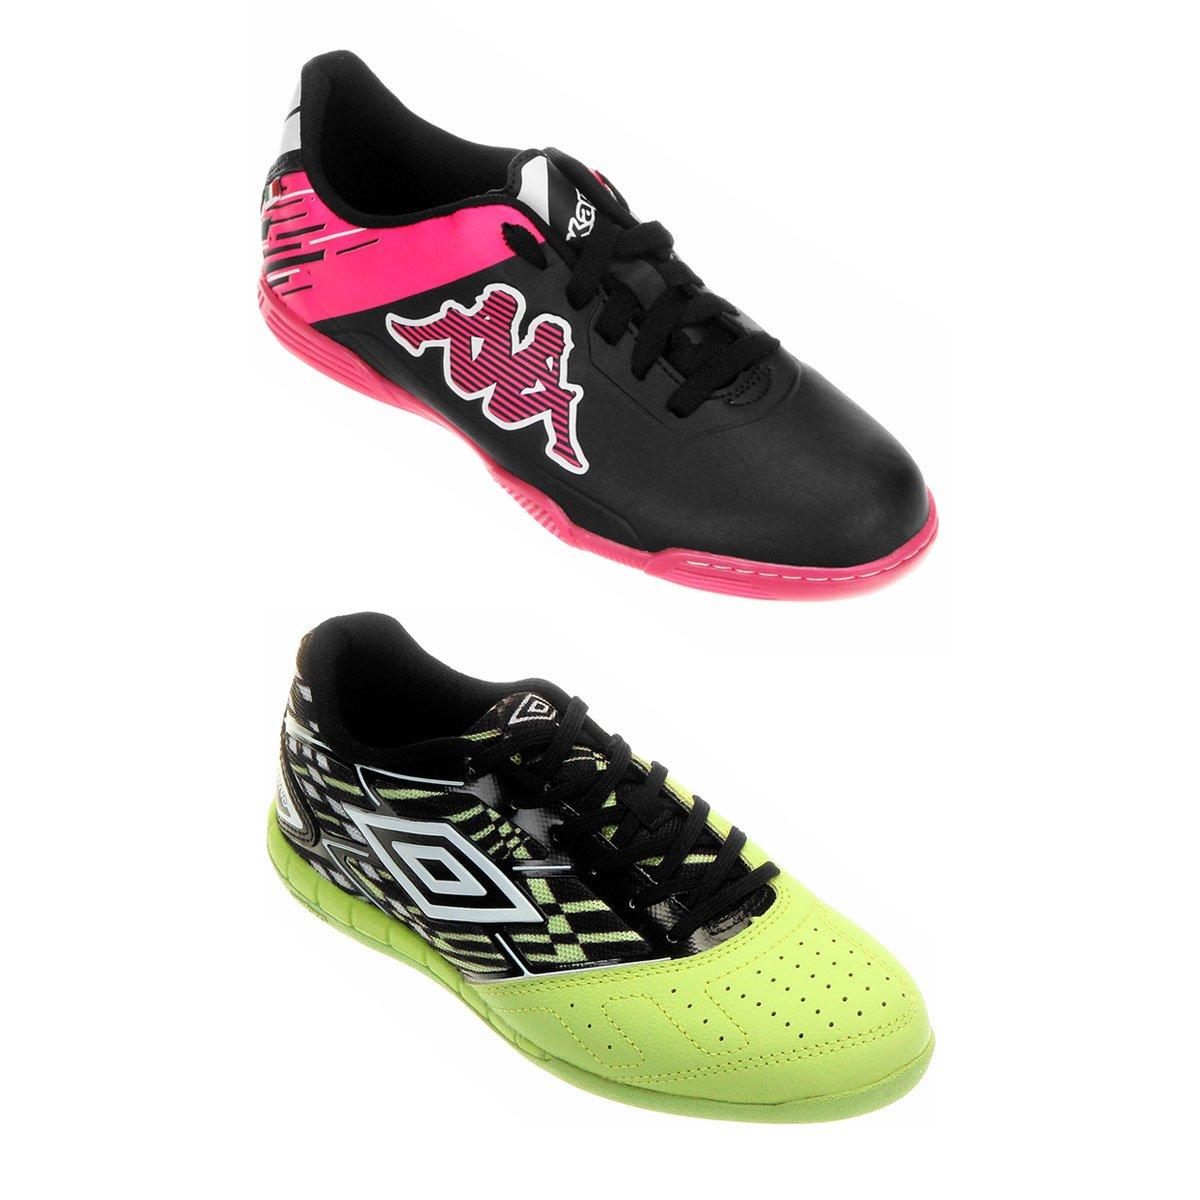 8dc49b9d188b1 Kit Chuteira Kappa Viento Futsal + Chuteira Umbro Diamond Futsal - Compre  Agora